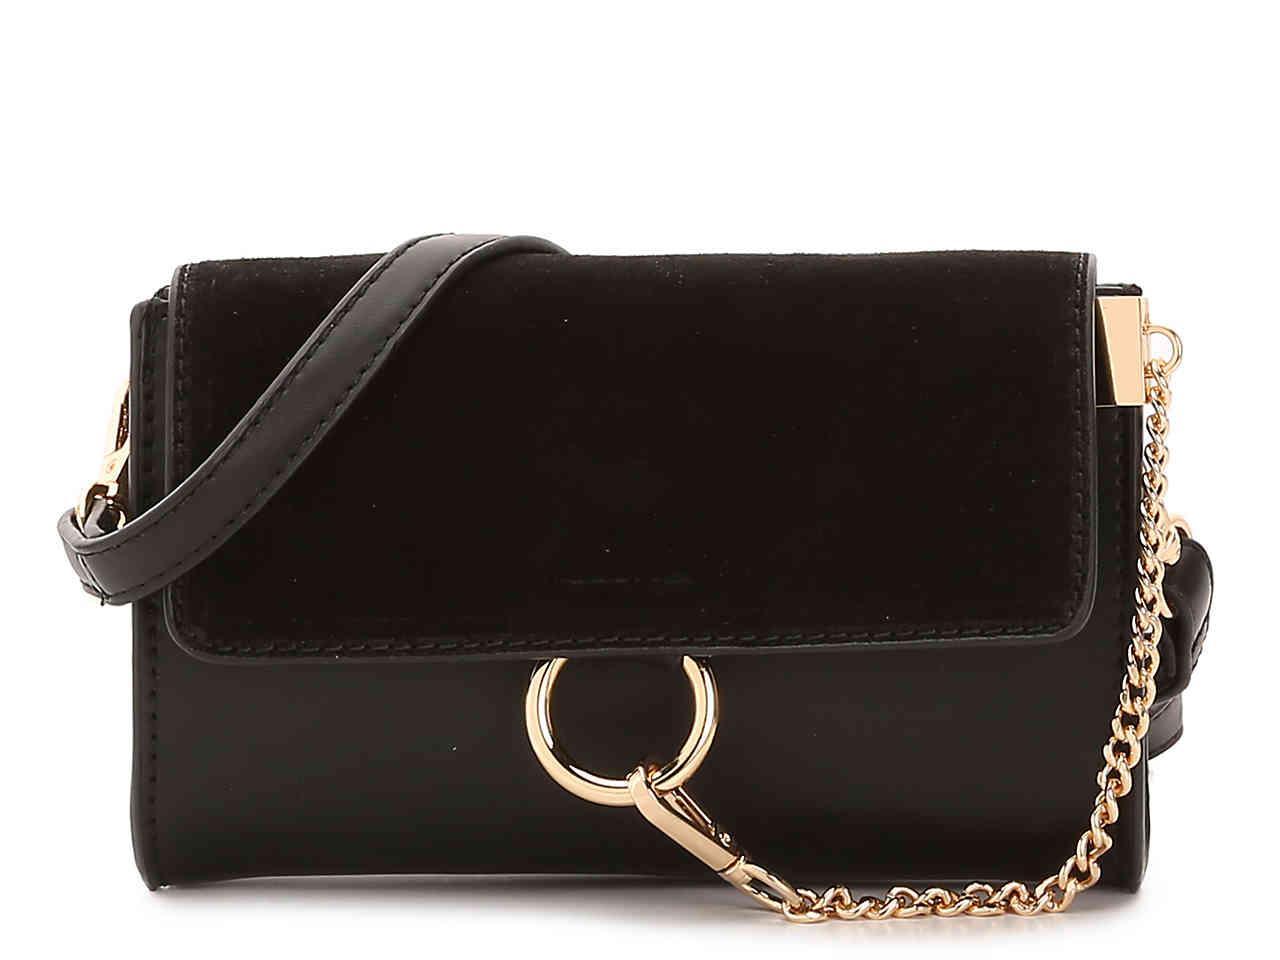 Lyst - Moda Luxe Carlotta Crossbody Bag in Black 033963c196